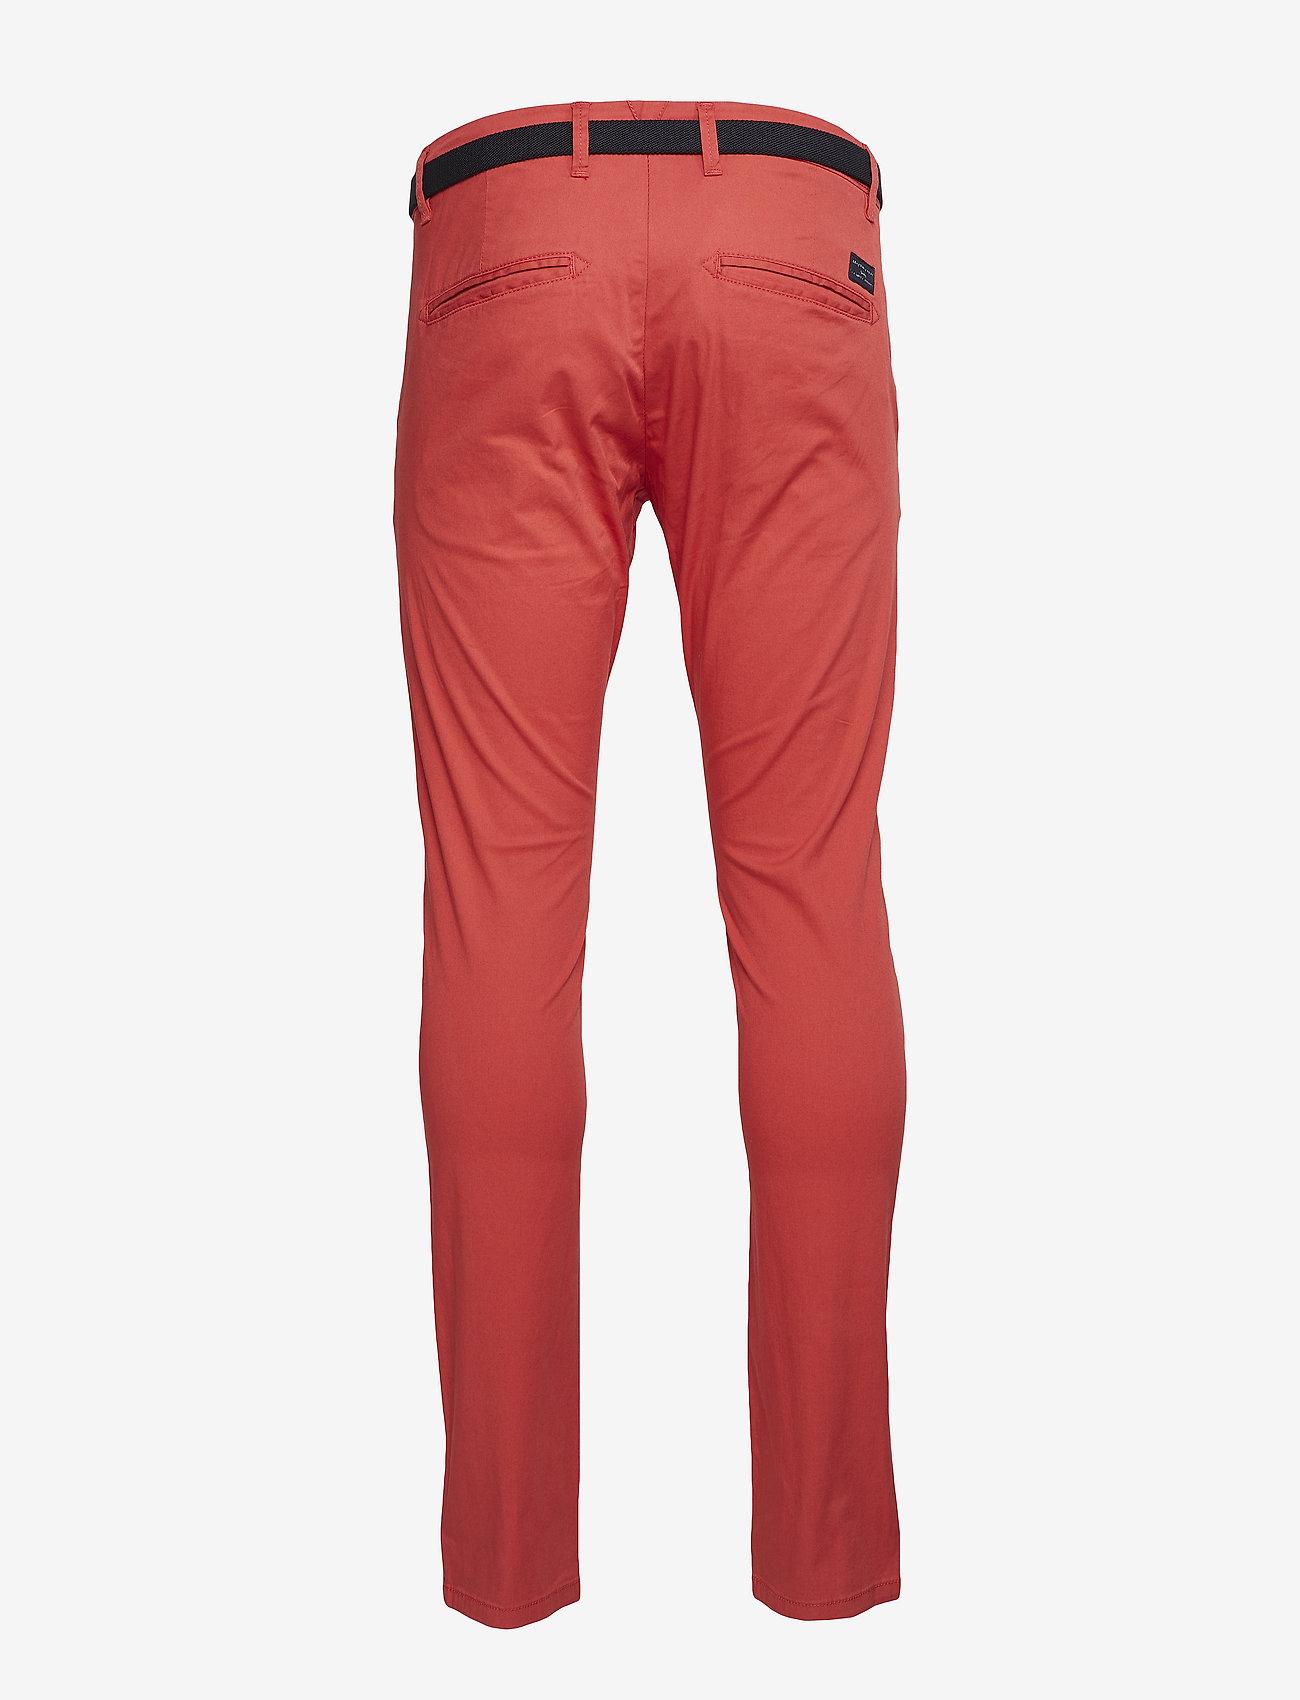 Selected Homme - SHHYARD CHRYSANTHEMUM SLIM ST PANTS - casual trousers - chrysanthemum